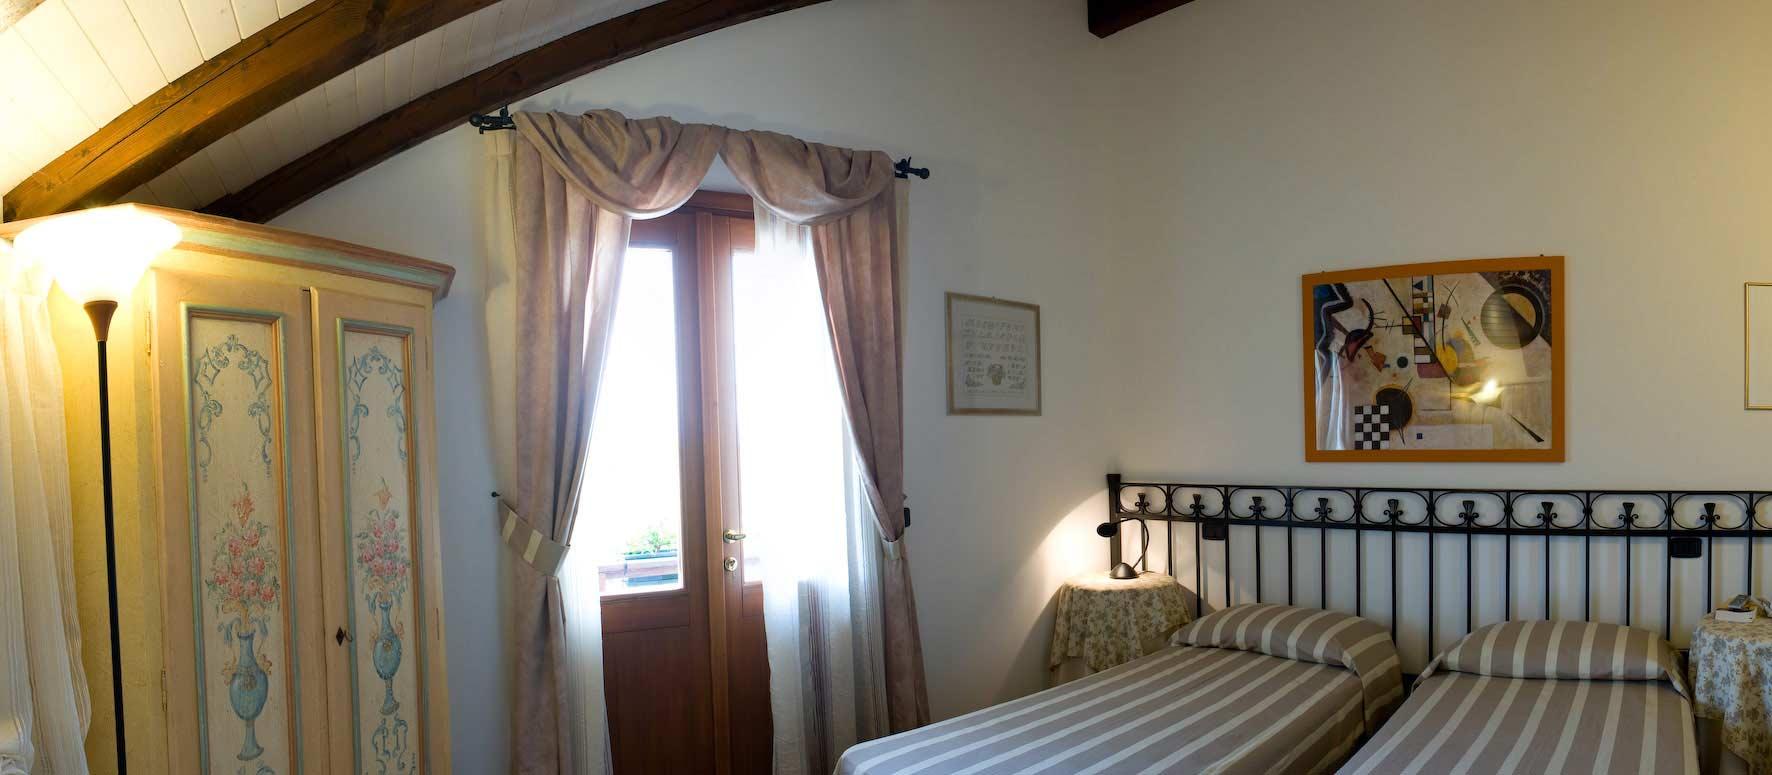 Camera Matrimoniale A Udine.Casale Degli Ulivi Camera Carolina